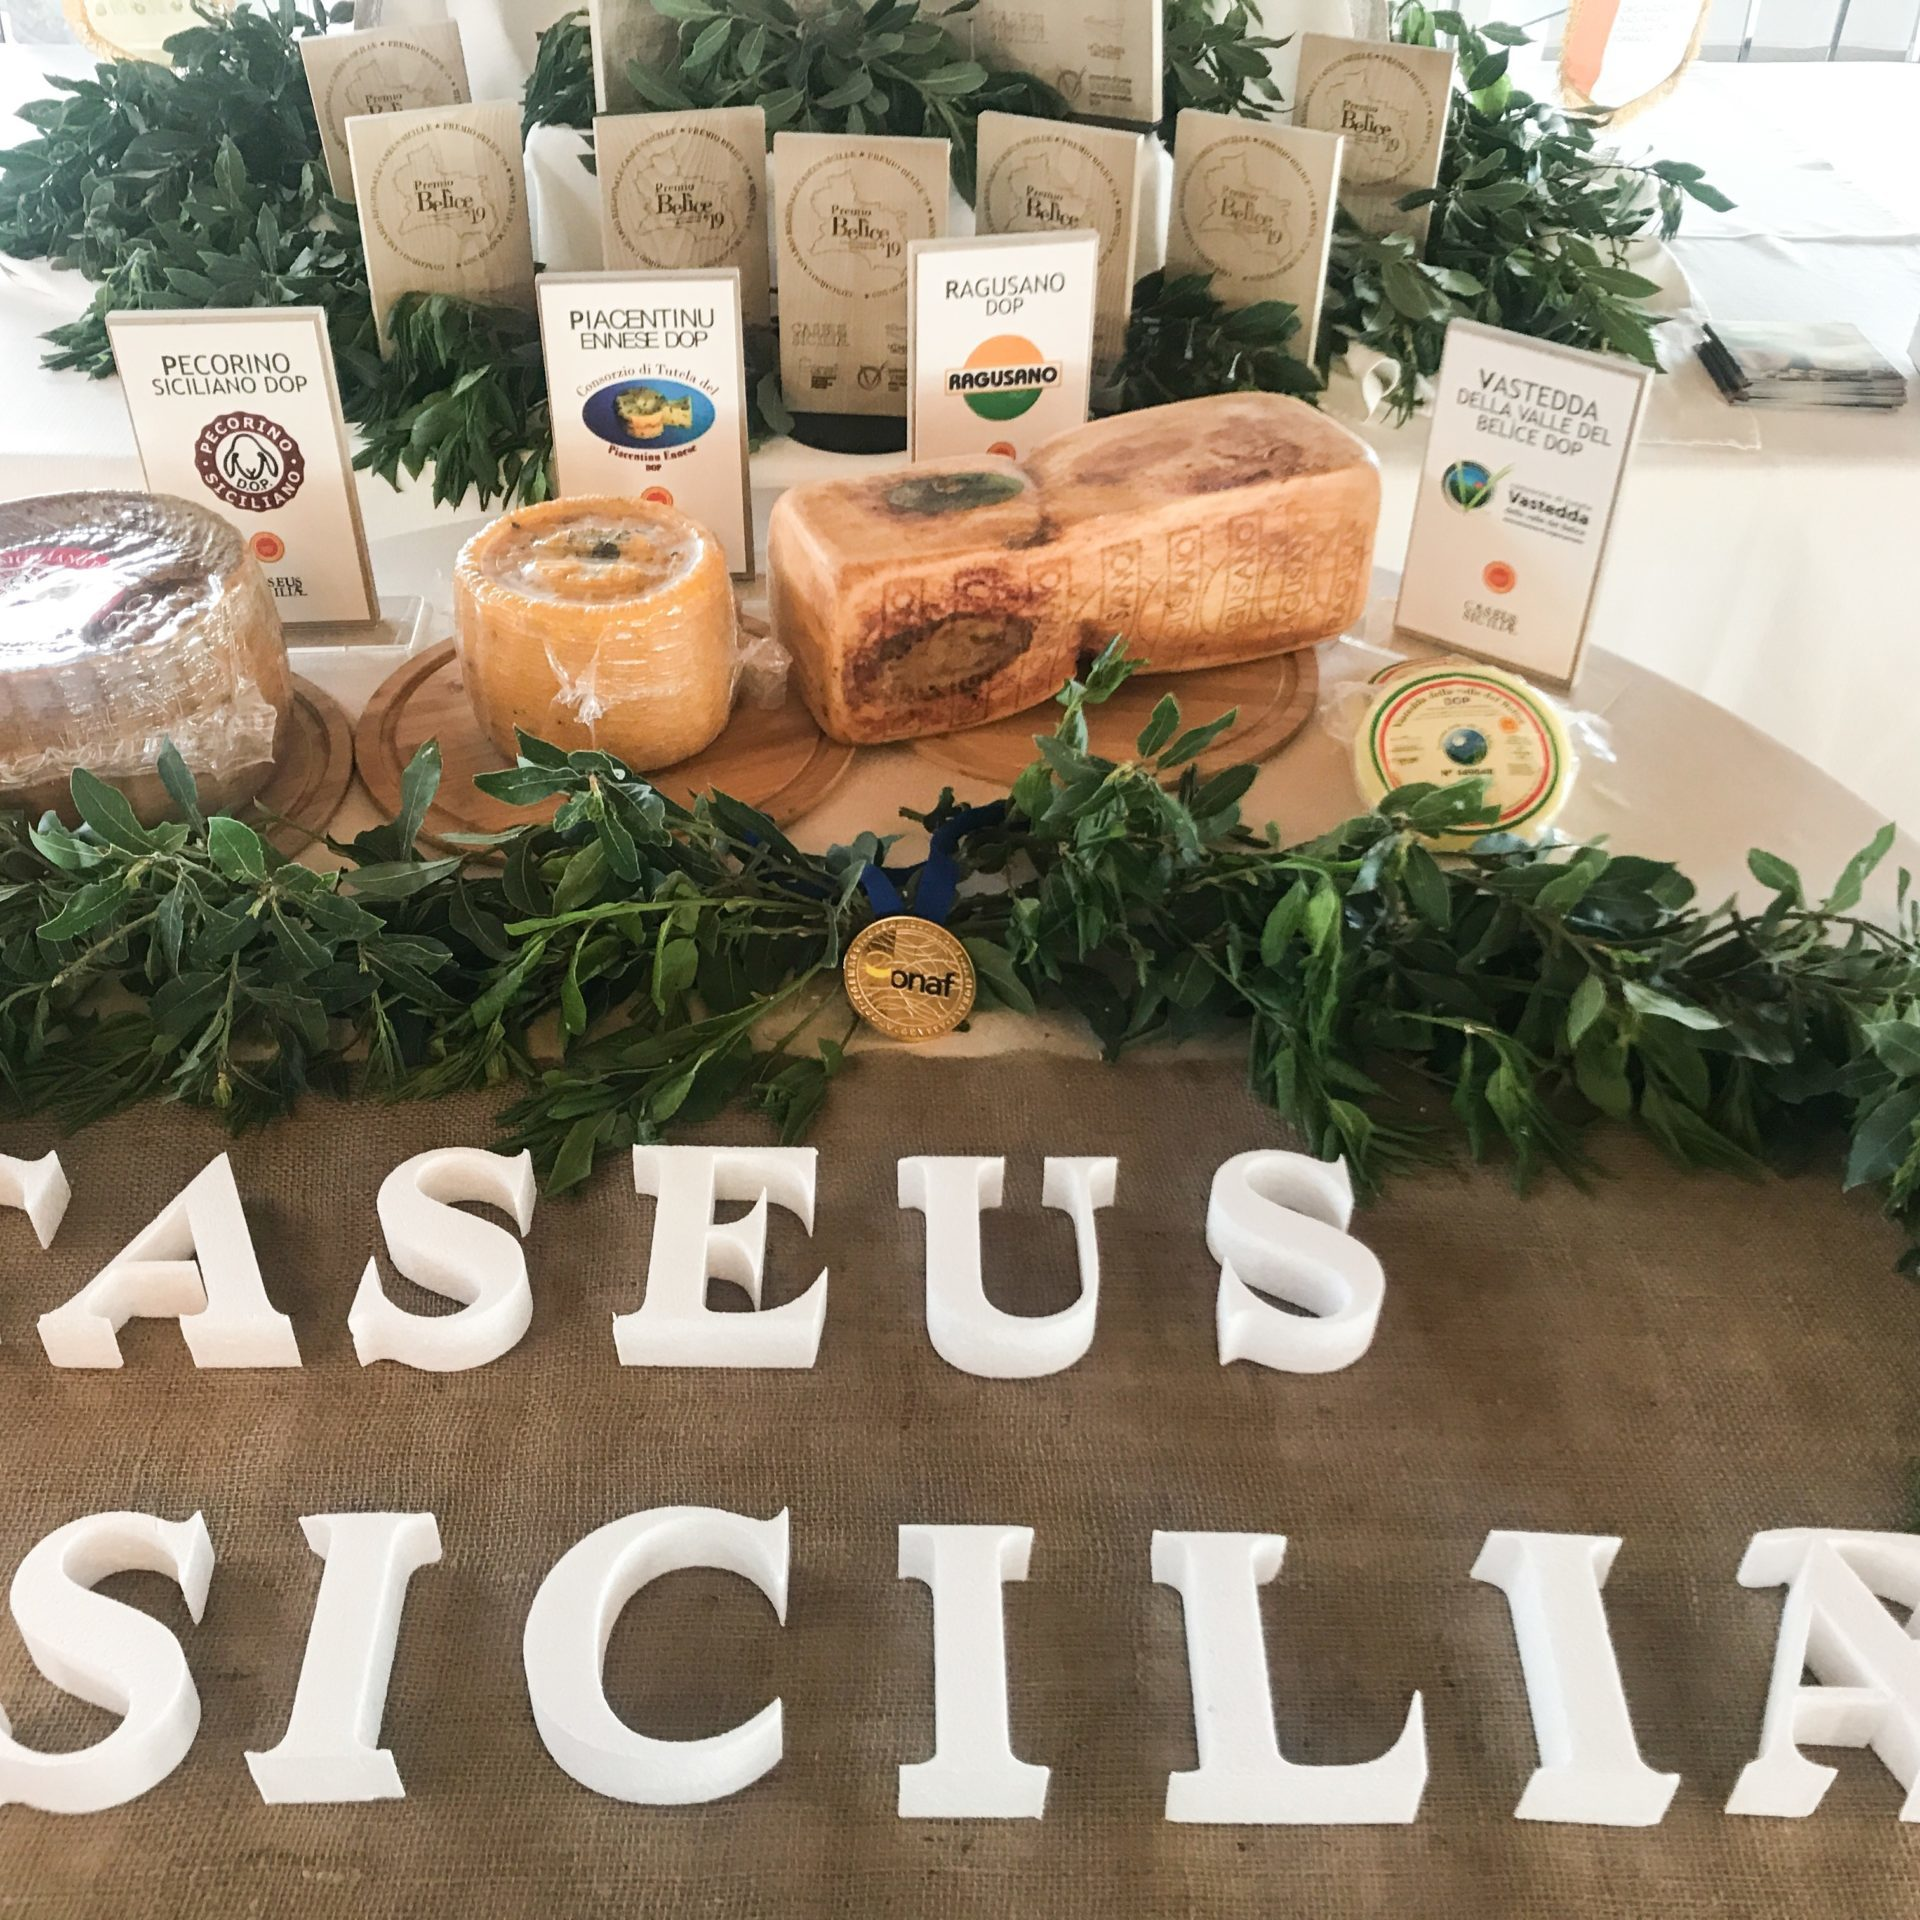 evento Caseus Siciliae